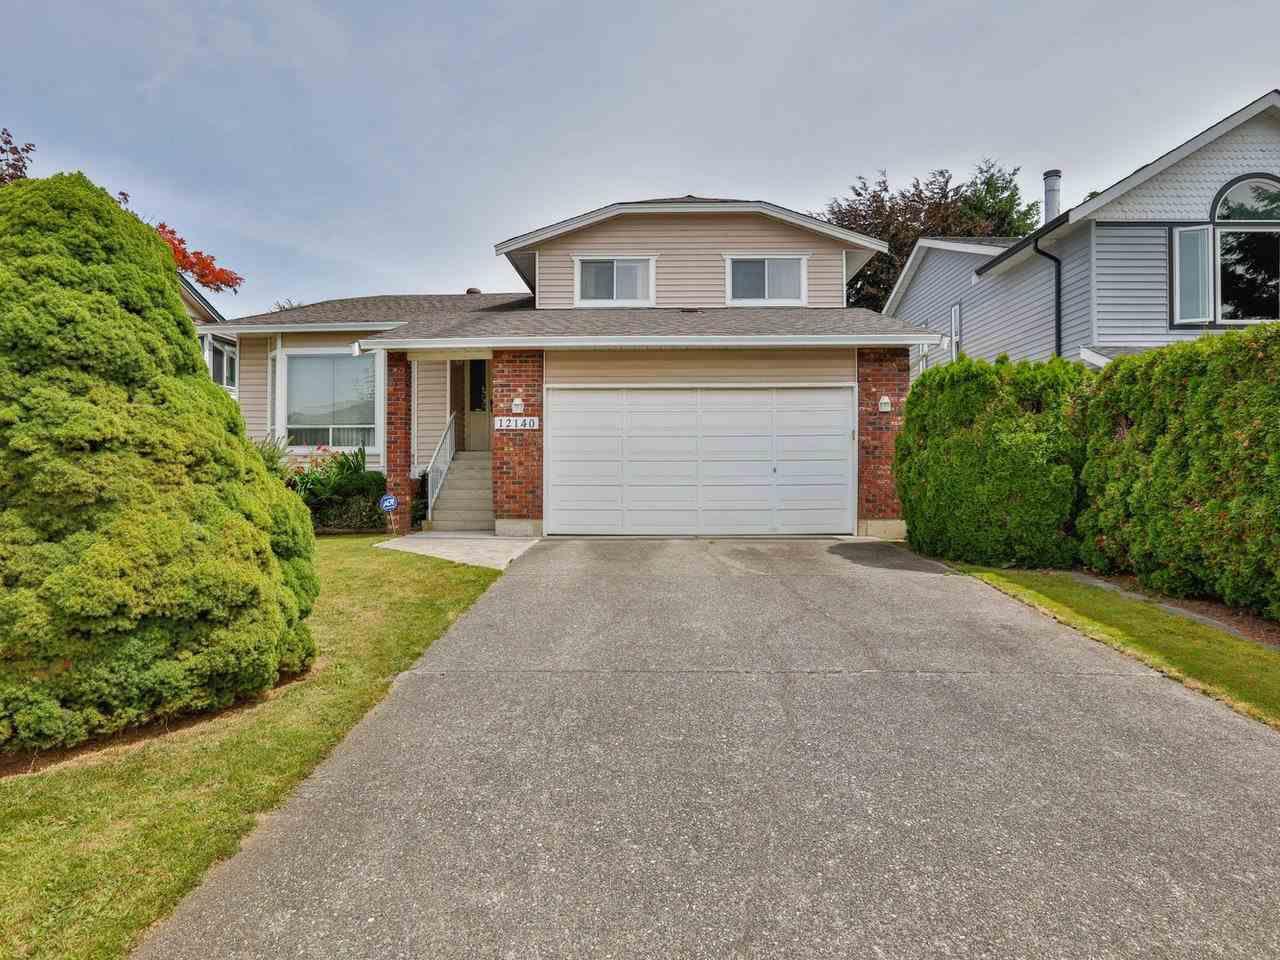 Main Photo: 12140 202 Street in Maple Ridge: Northwest Maple Ridge House for sale : MLS®# R2394155